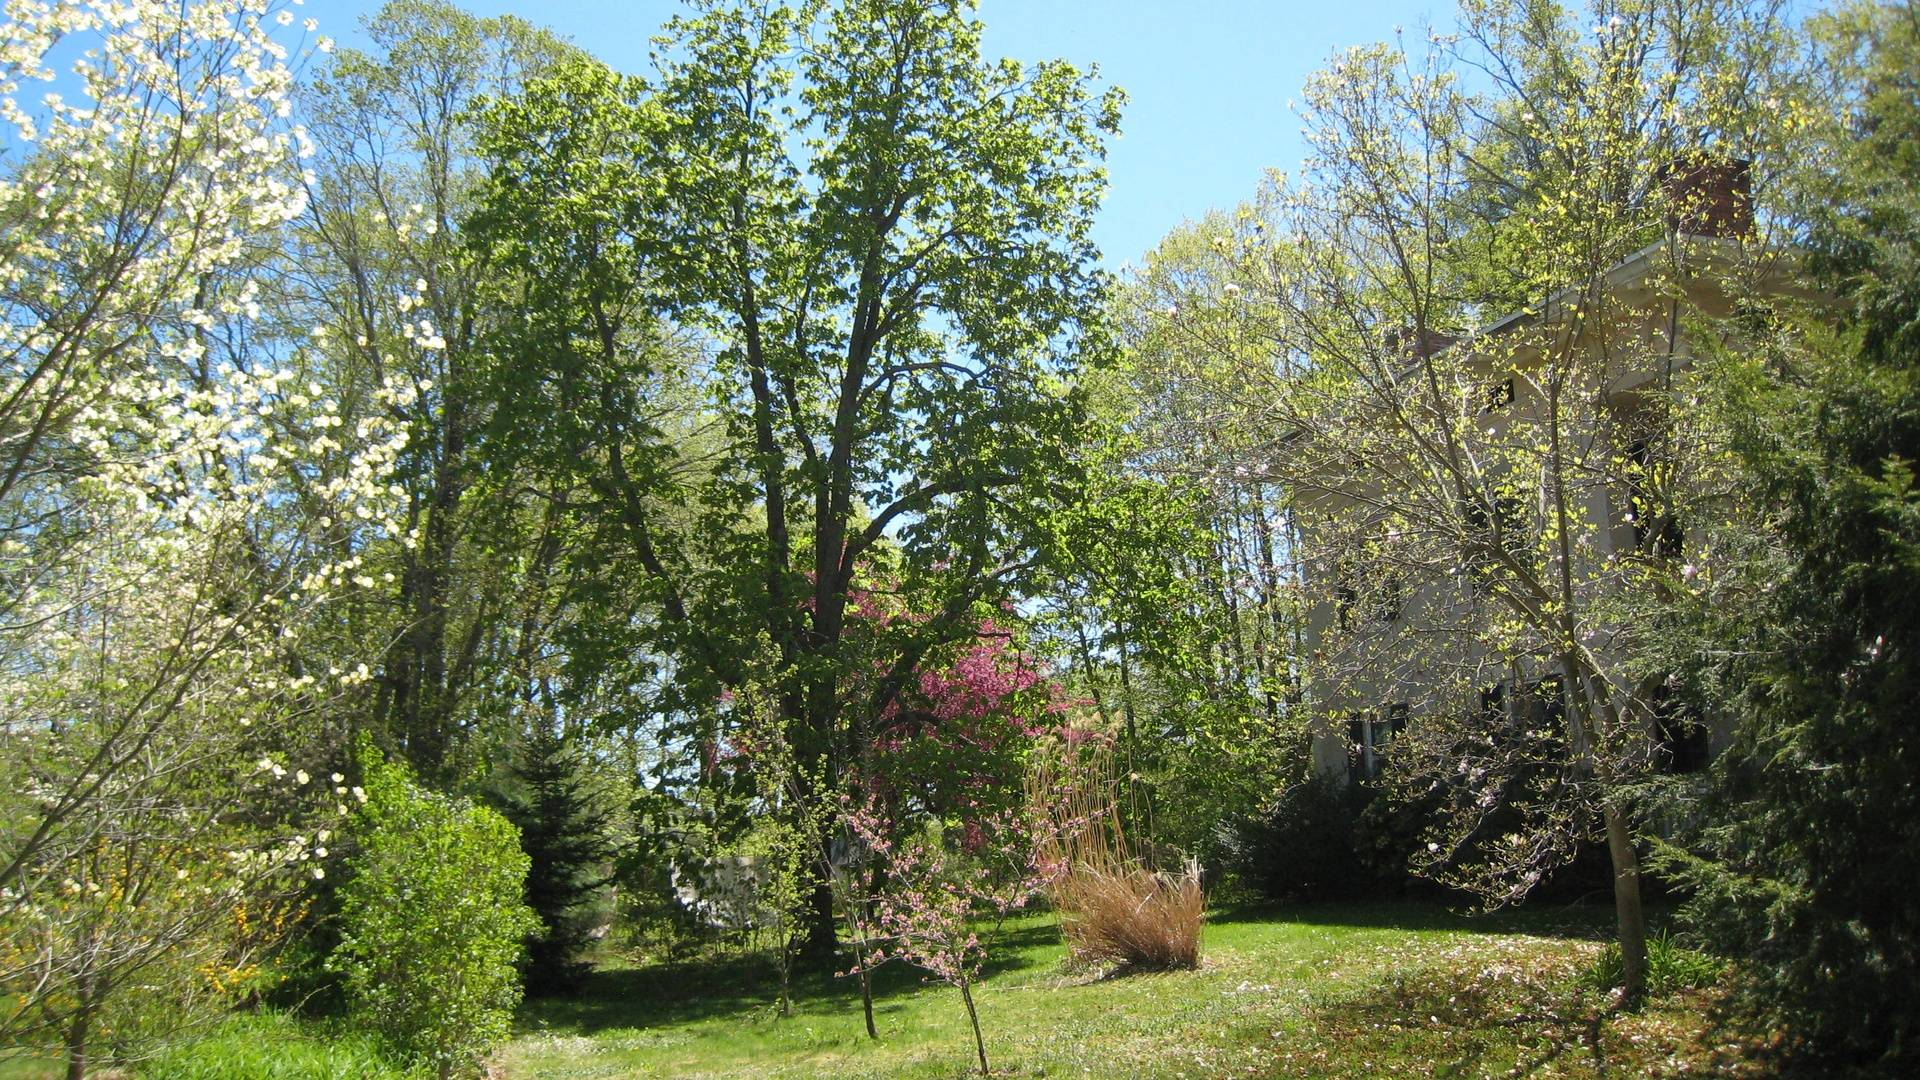 Surrounding Gardens in Spring